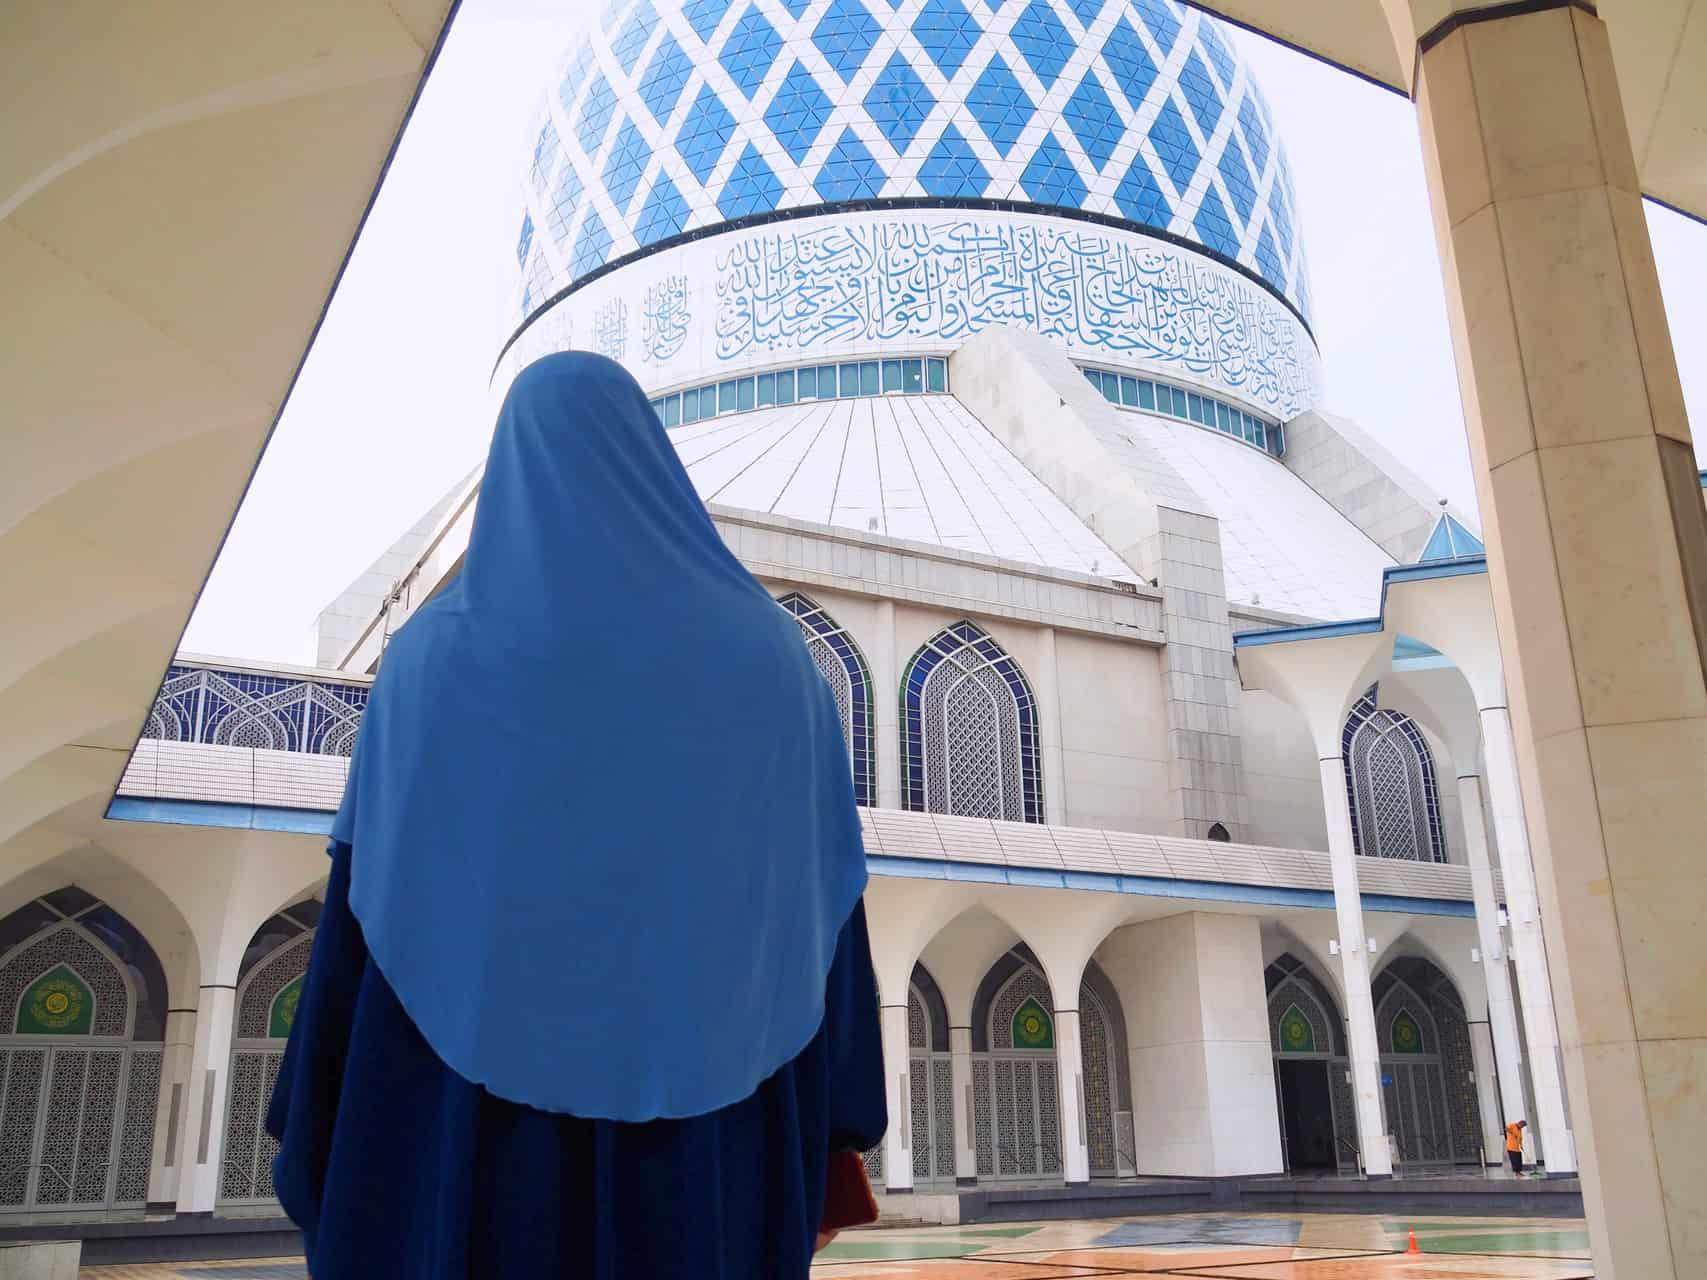 Sultan-Salahuddin-Abdul-Aziz-Blue-Mosque-Shah-Alam-Kuala-Lumpur-Malaysia-Travel-Mermaid